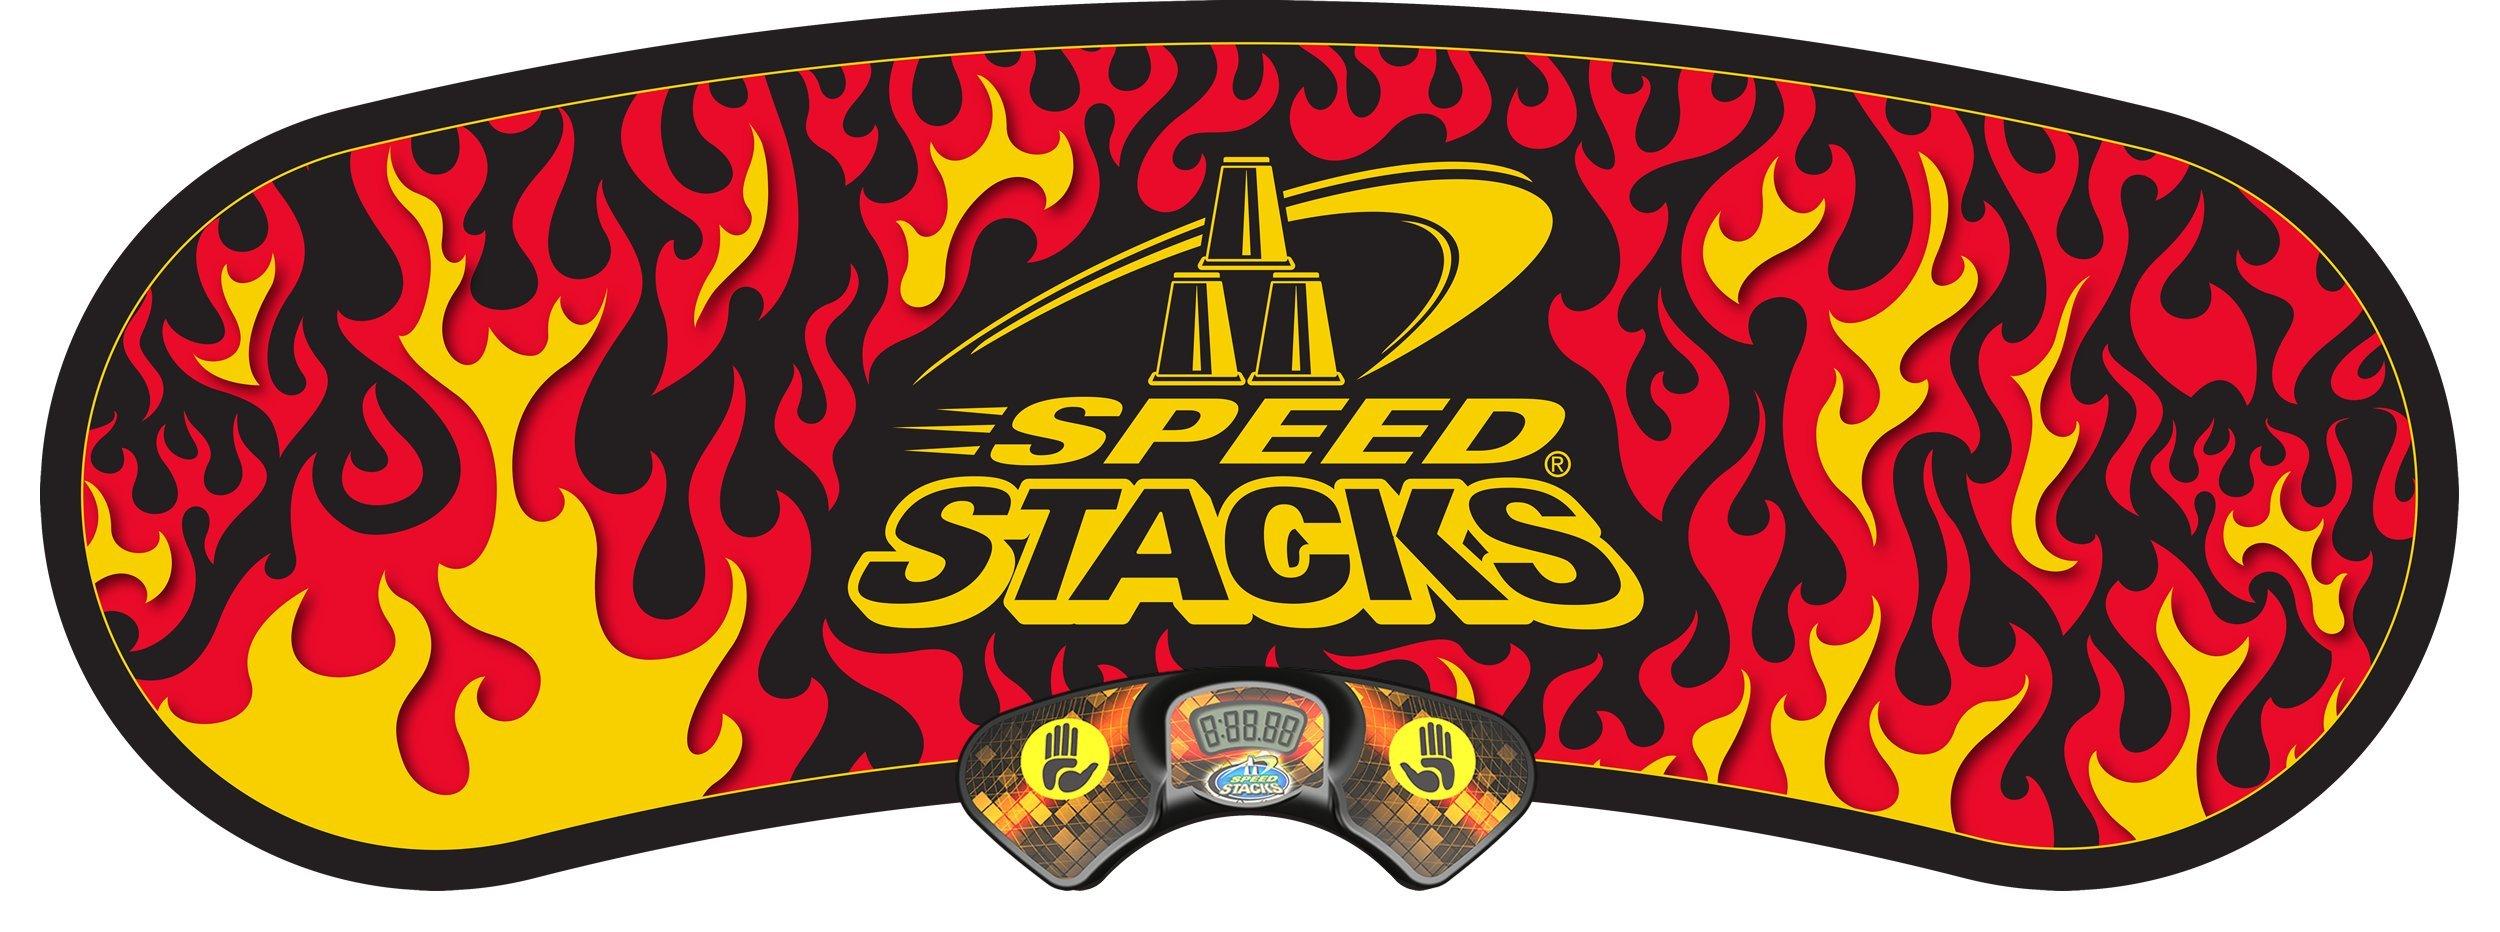 Speed Stacks GX STACKMAT - Black Flame